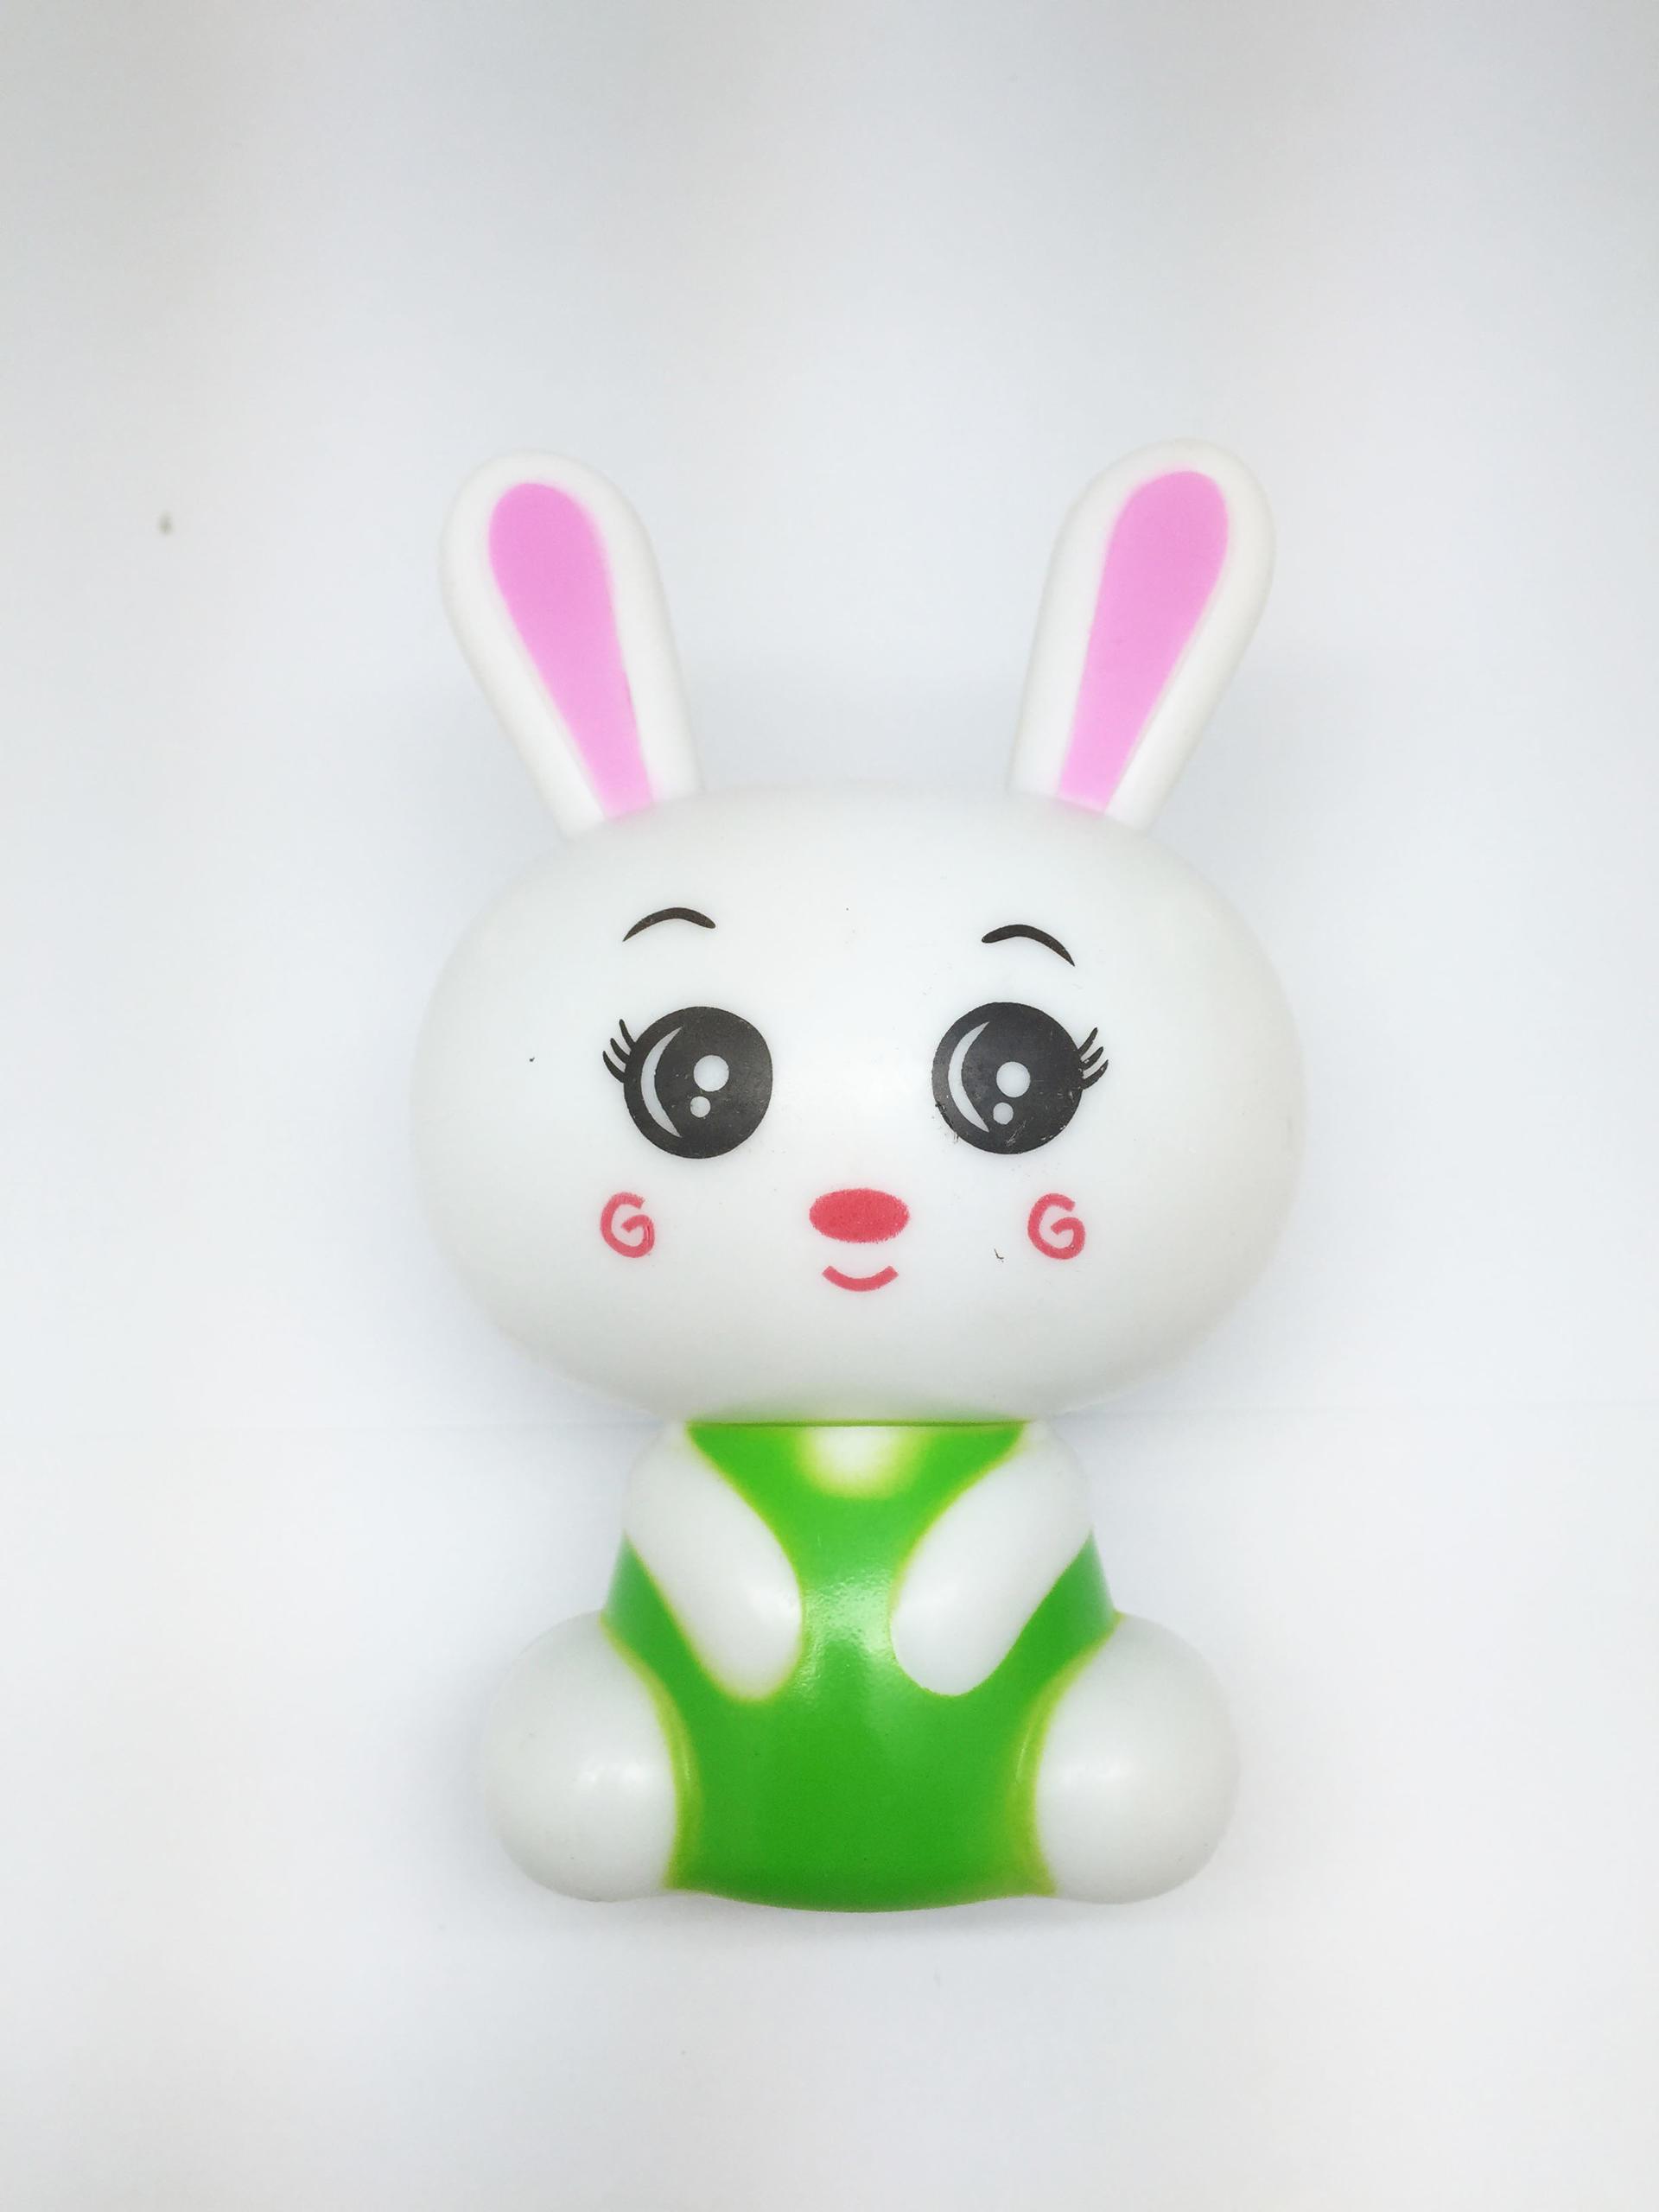 OEM0.6W and 110V or 220V W021 White cute rabbit shape LED SMD mini switch plug in night light